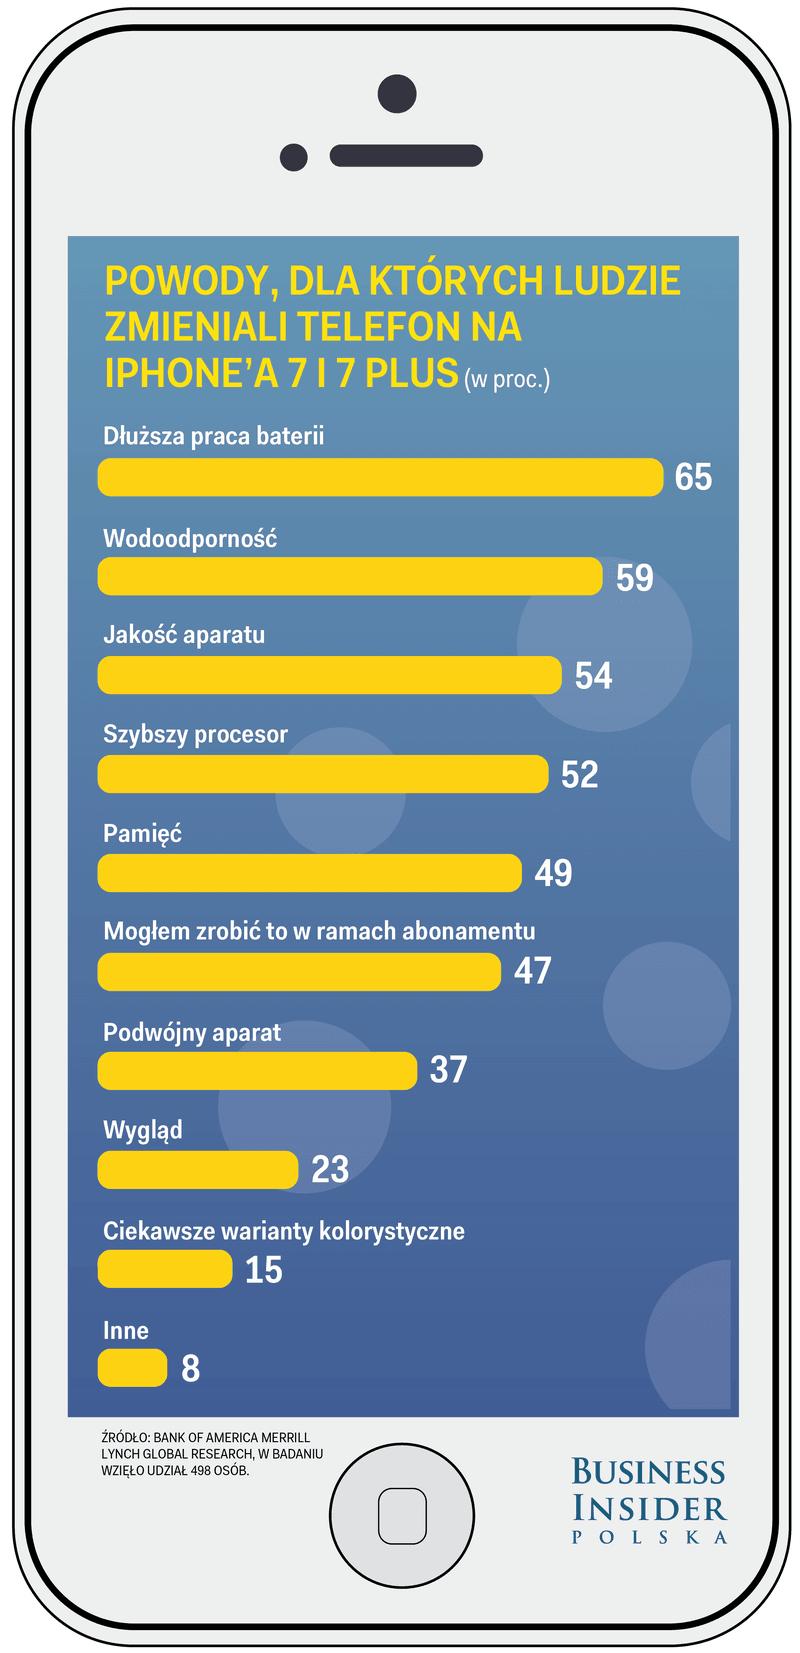 iphone-7-iphone-7-plus-powody-zakupu